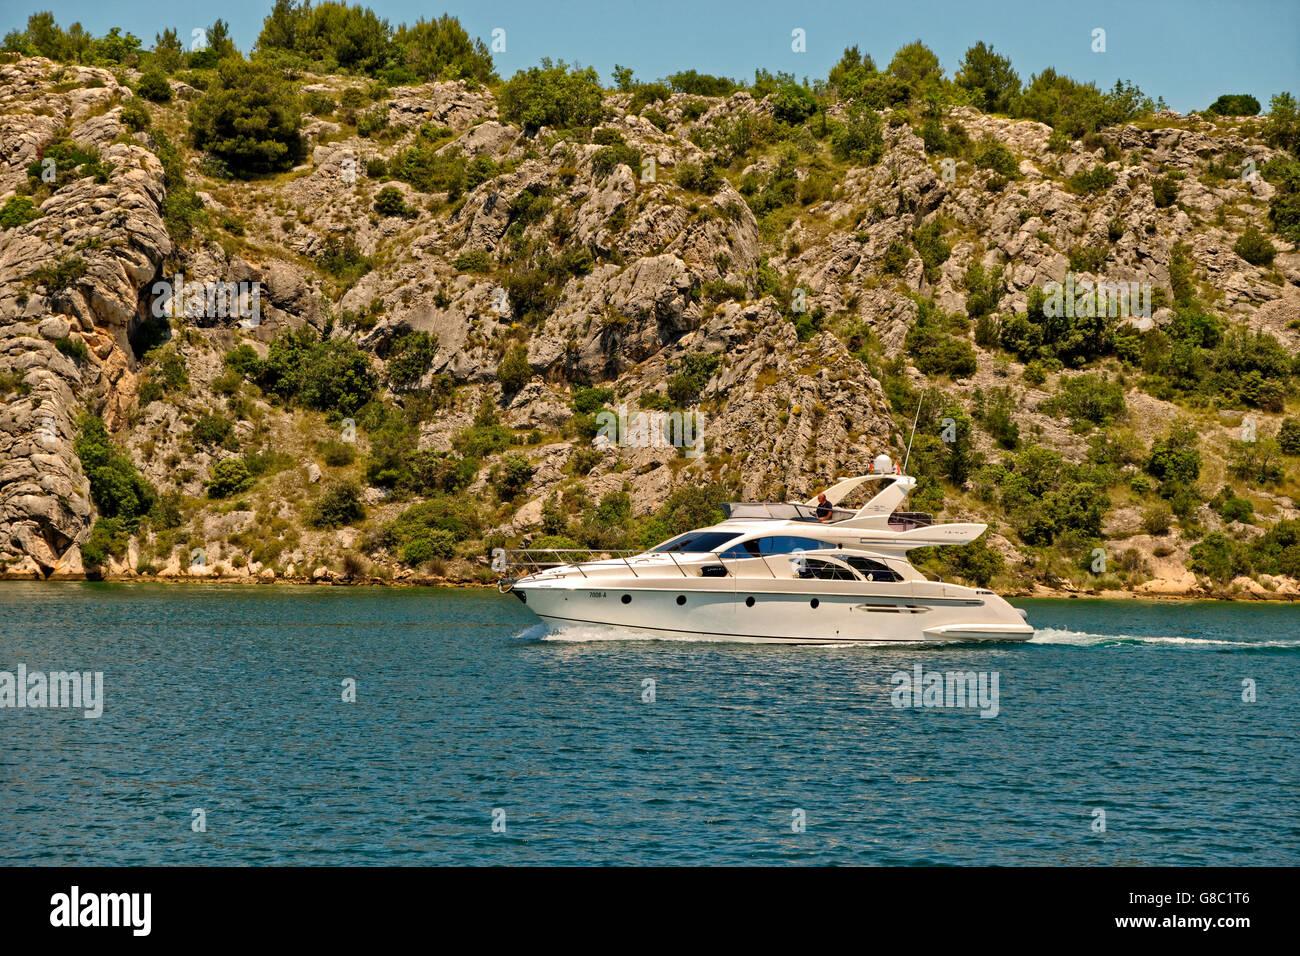 Cruising yacht motoring near Sibenik on the Cikola River, Dalmatia, Croatia. - Stock Image